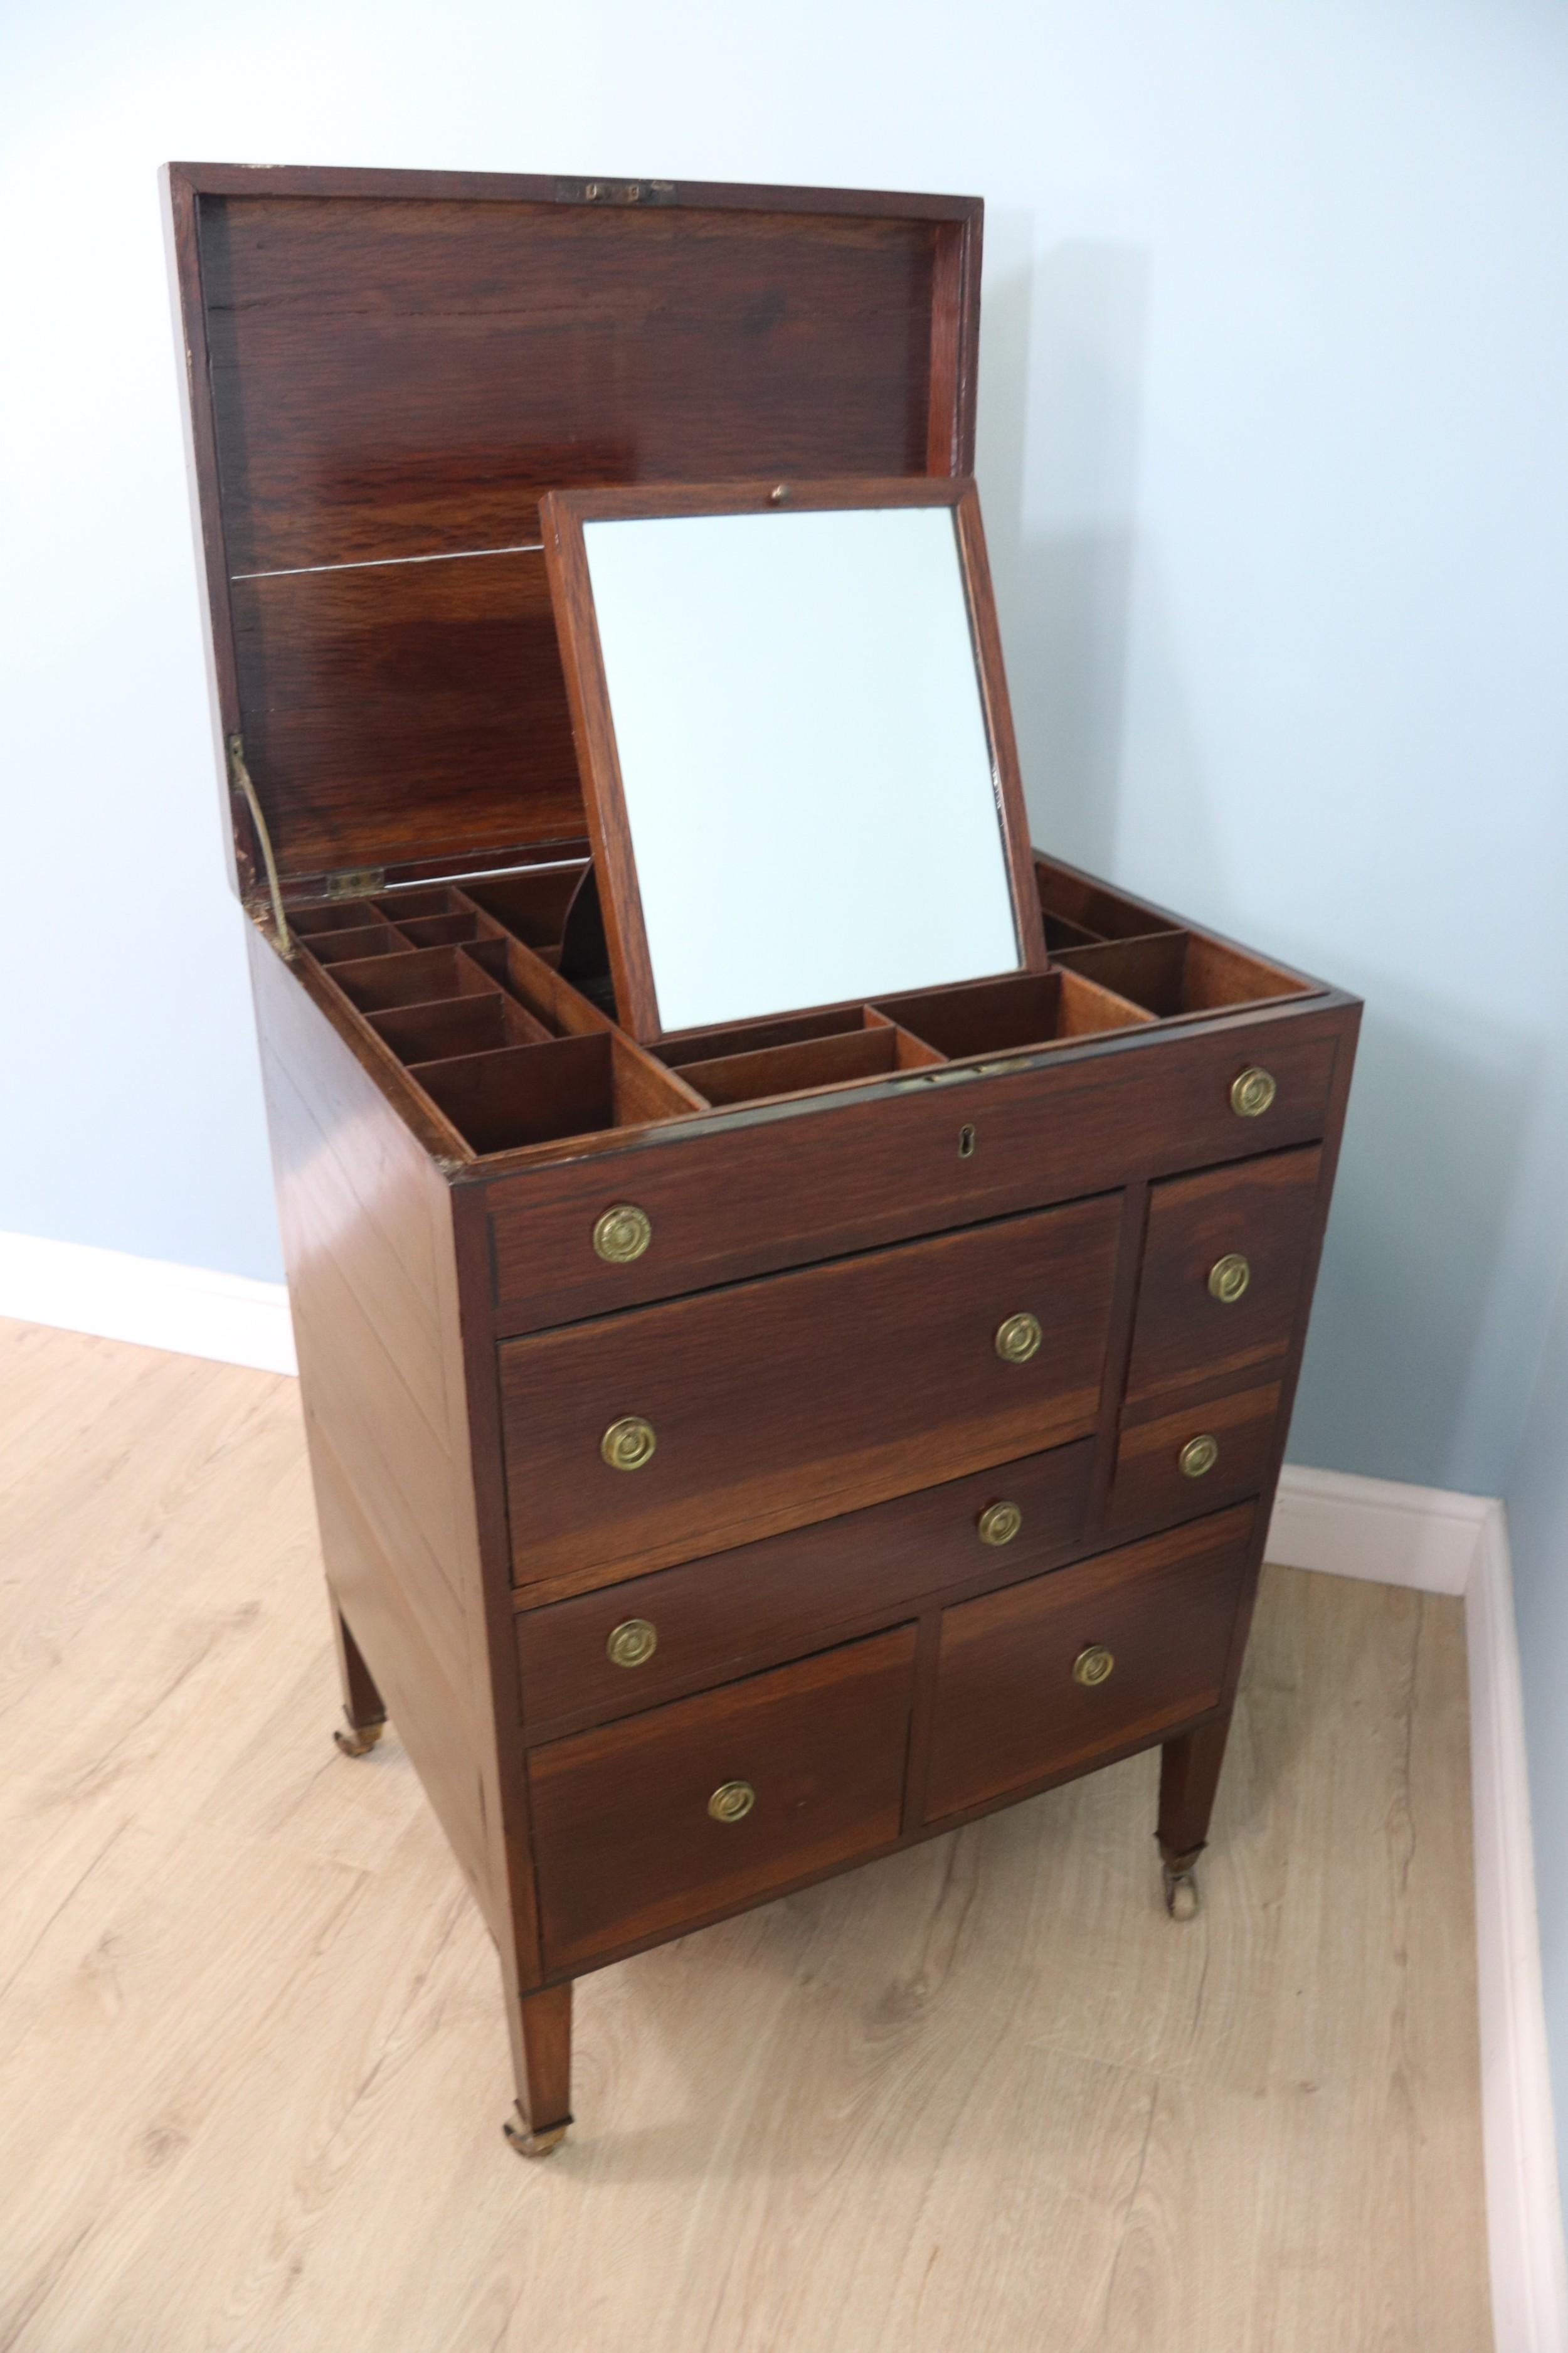 19th century vanity table with flip top lid